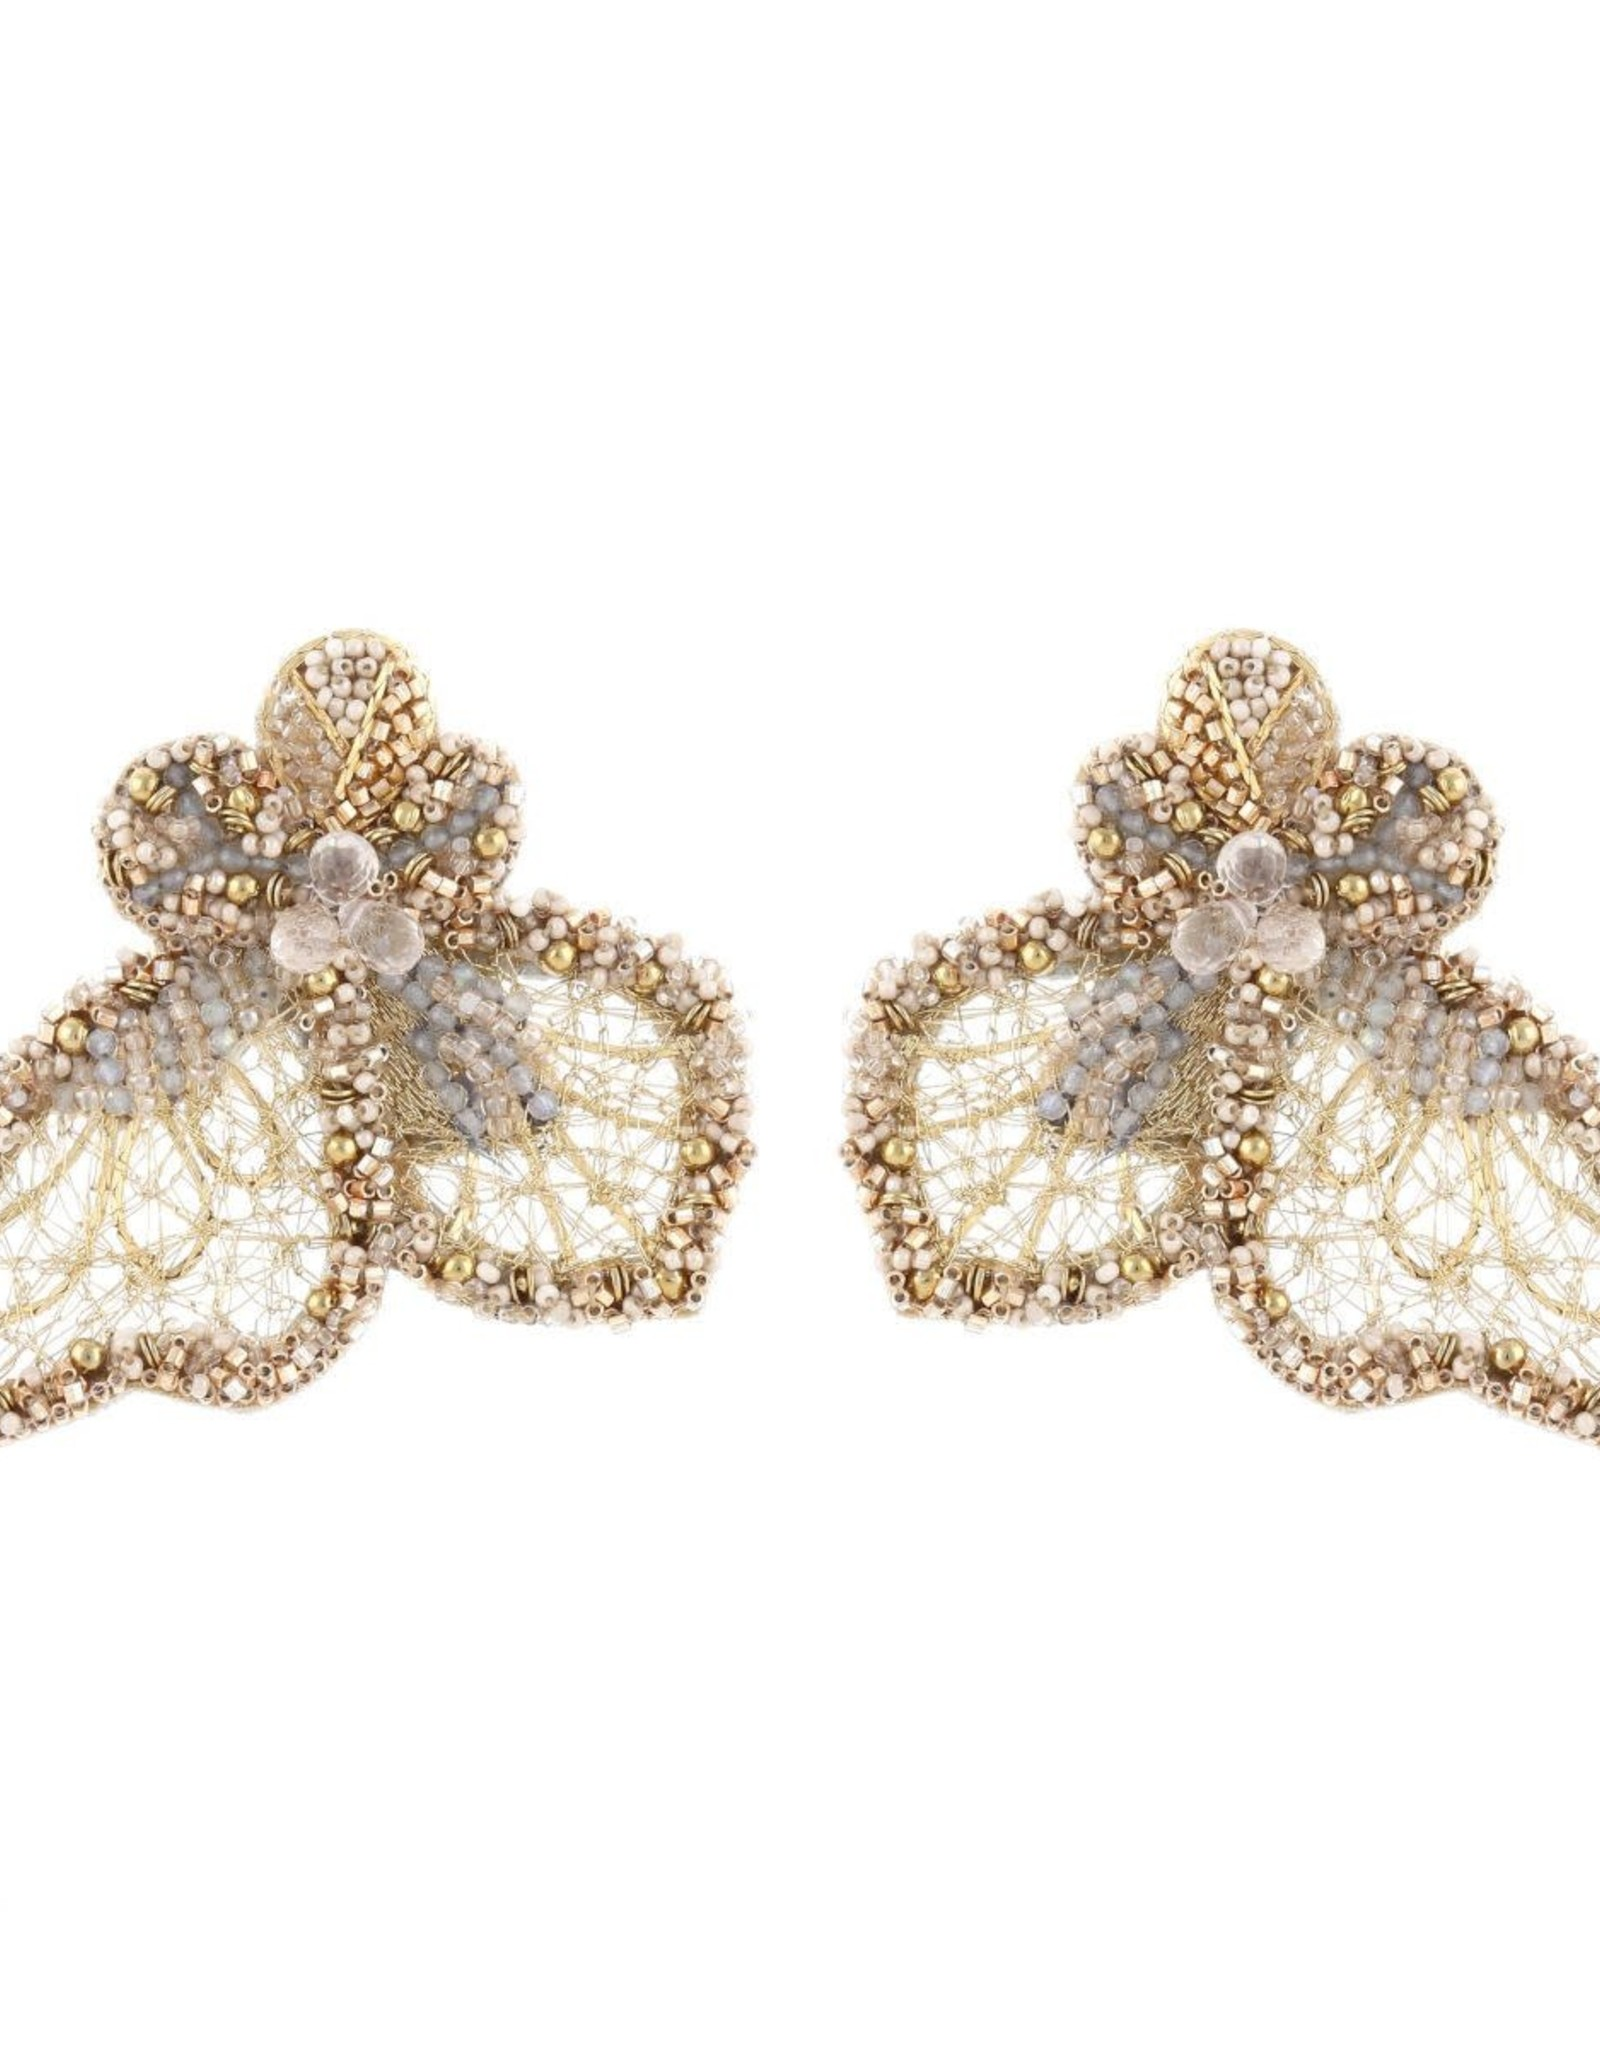 Deepa Gurnani Deepa Gurnani Clare Earrings CLIP-ON